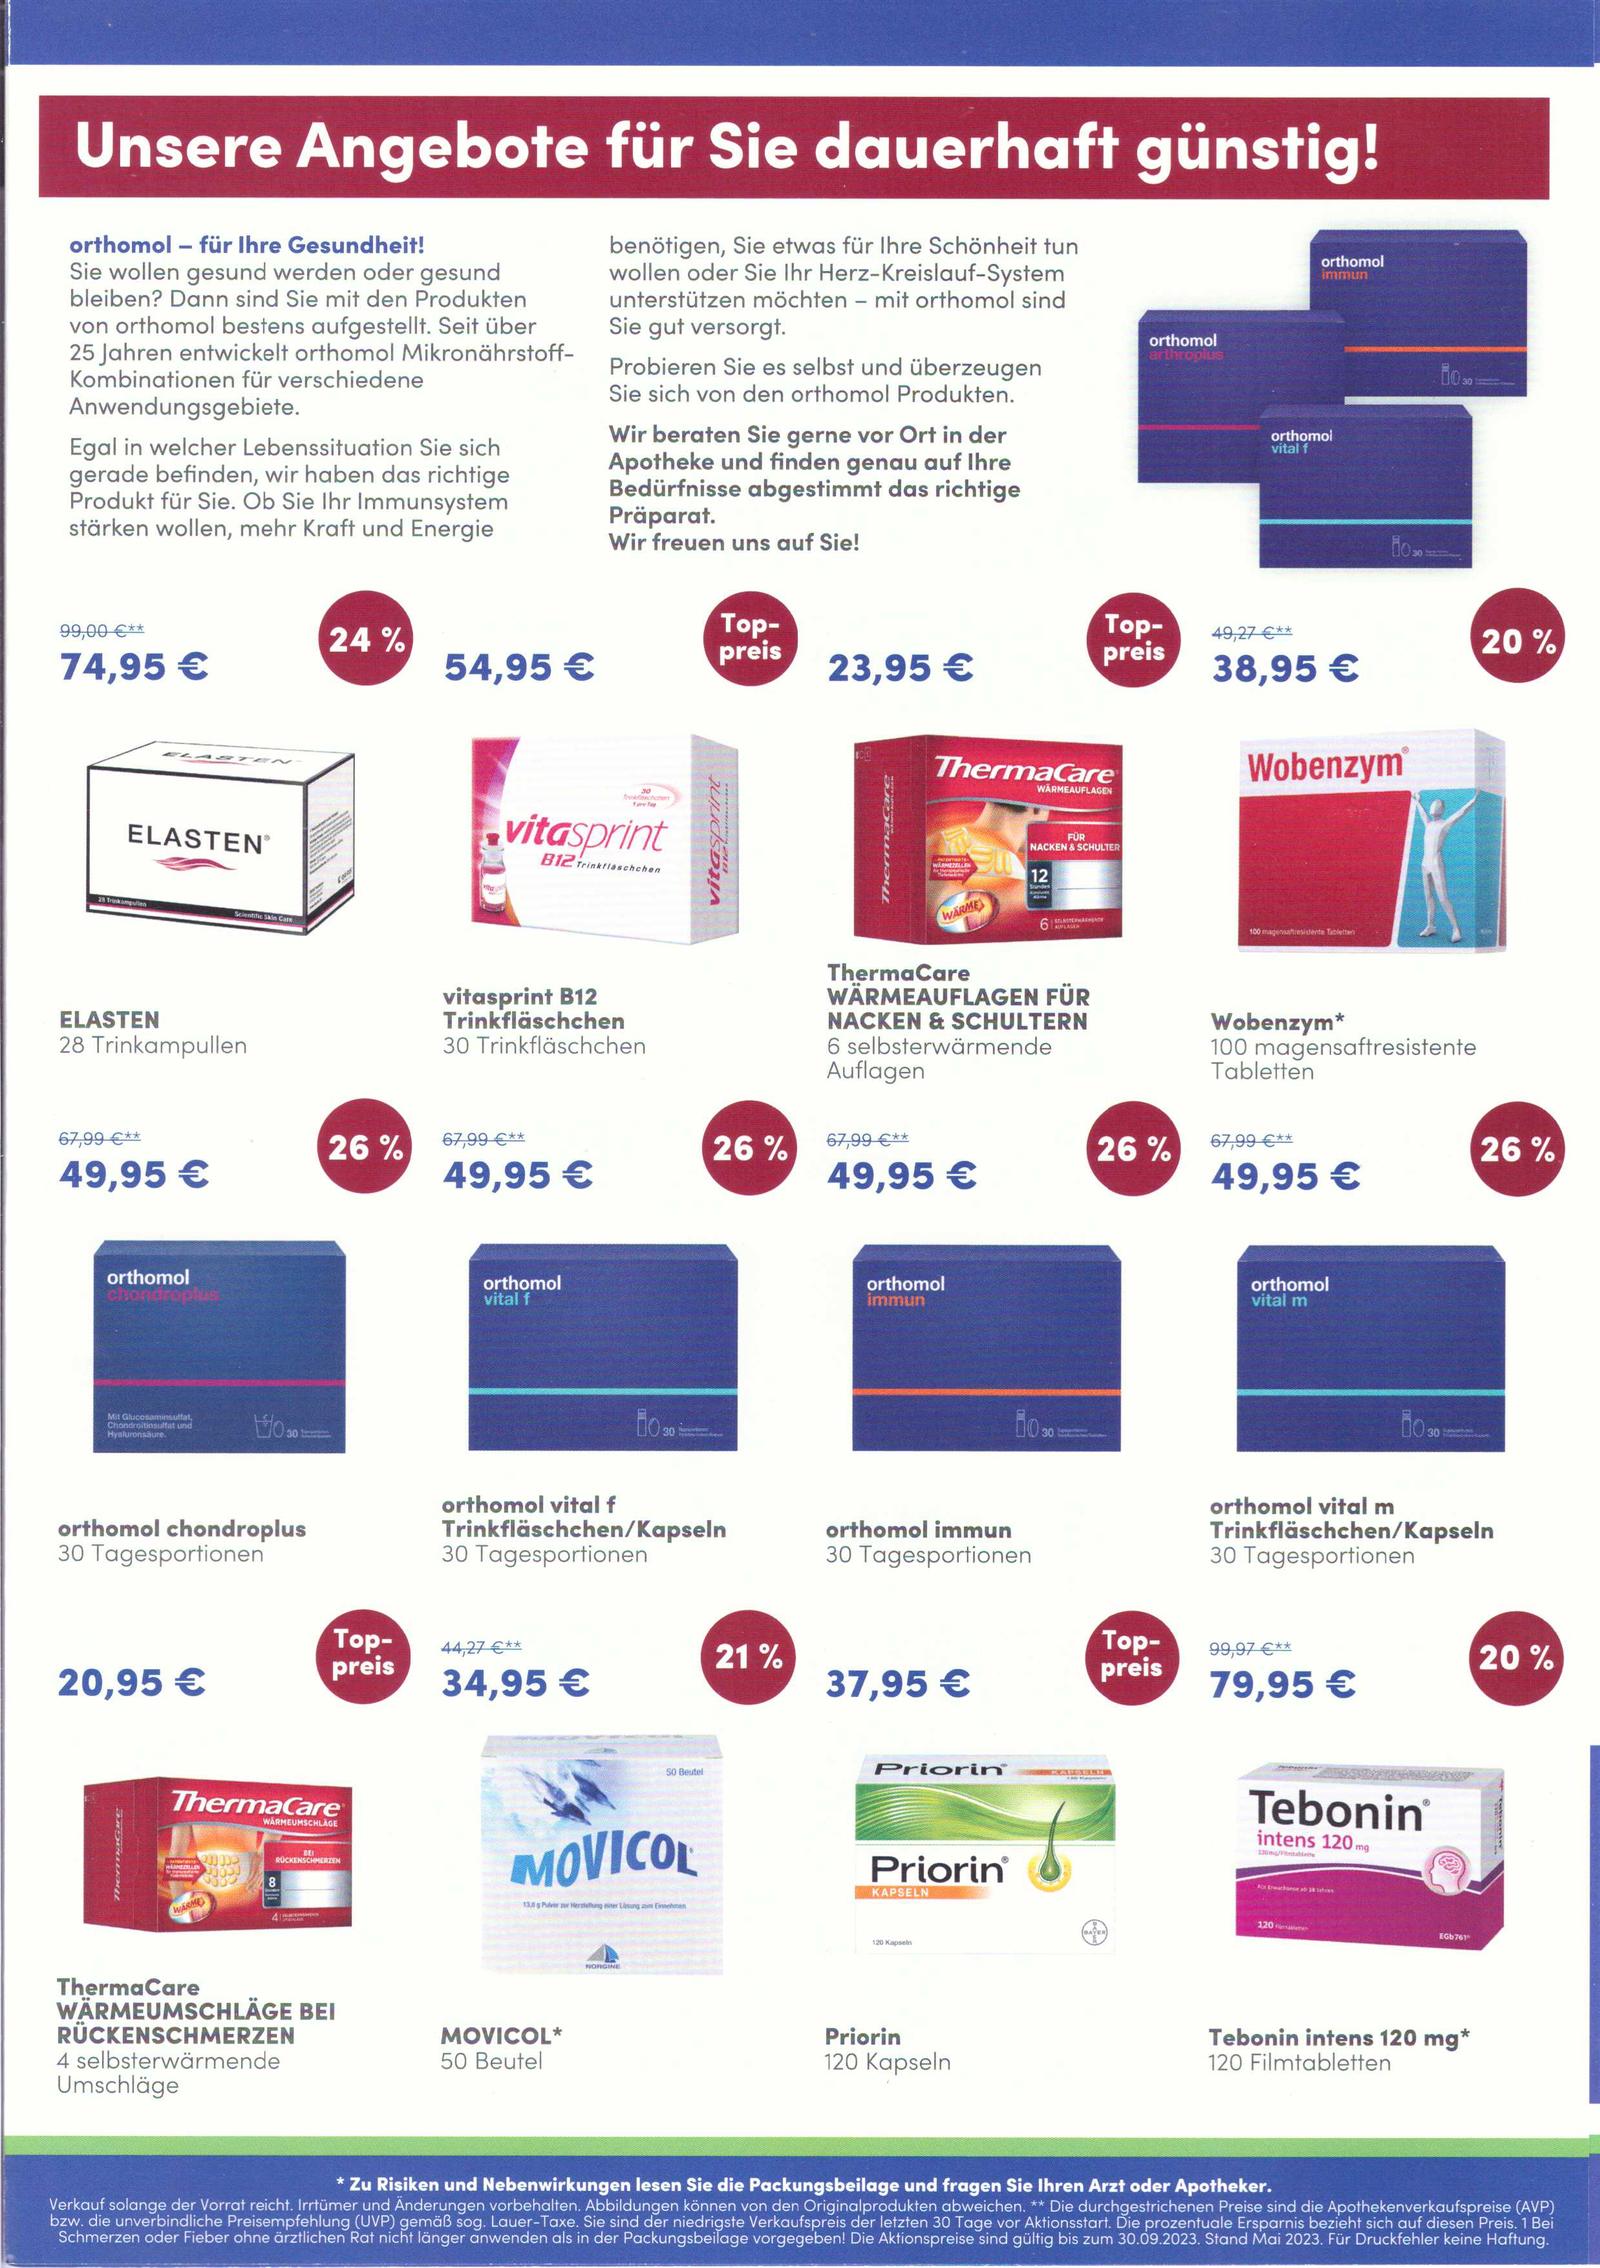 https://mein-uploads.apocdn.net/1117/leaflets/1117_flyer-Seite4.png